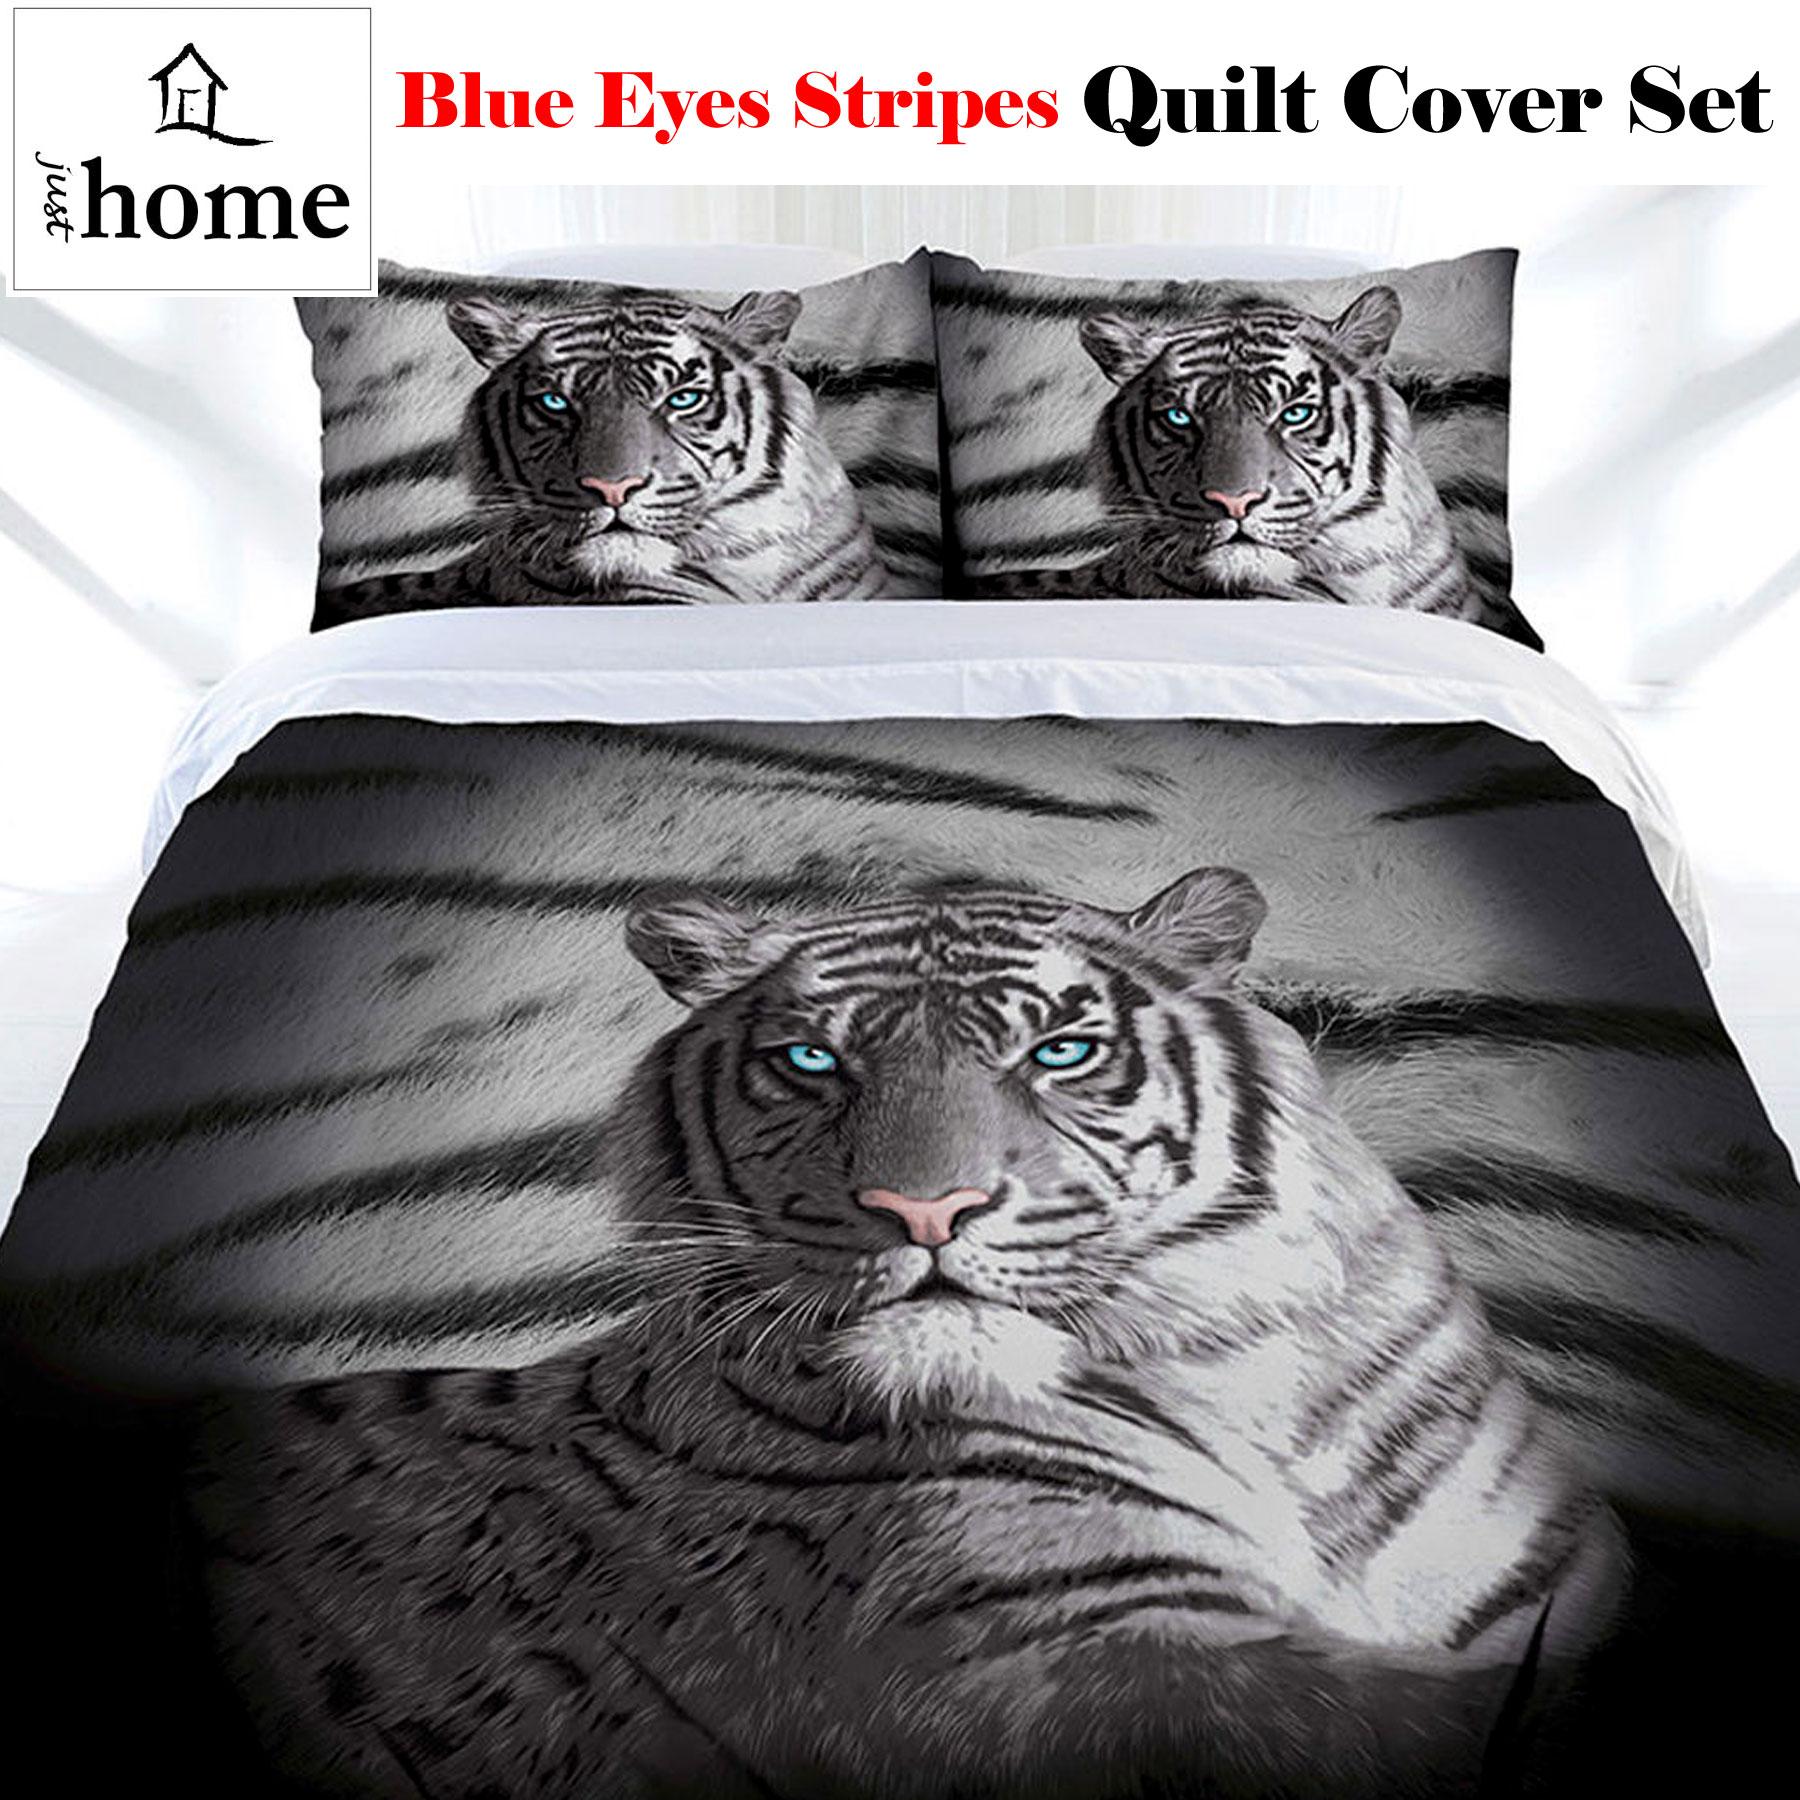 Blue Eyes Stripes Tiger Quilt Doona Duvet Cover Set SINGLE DOUBLE QUEEN KING